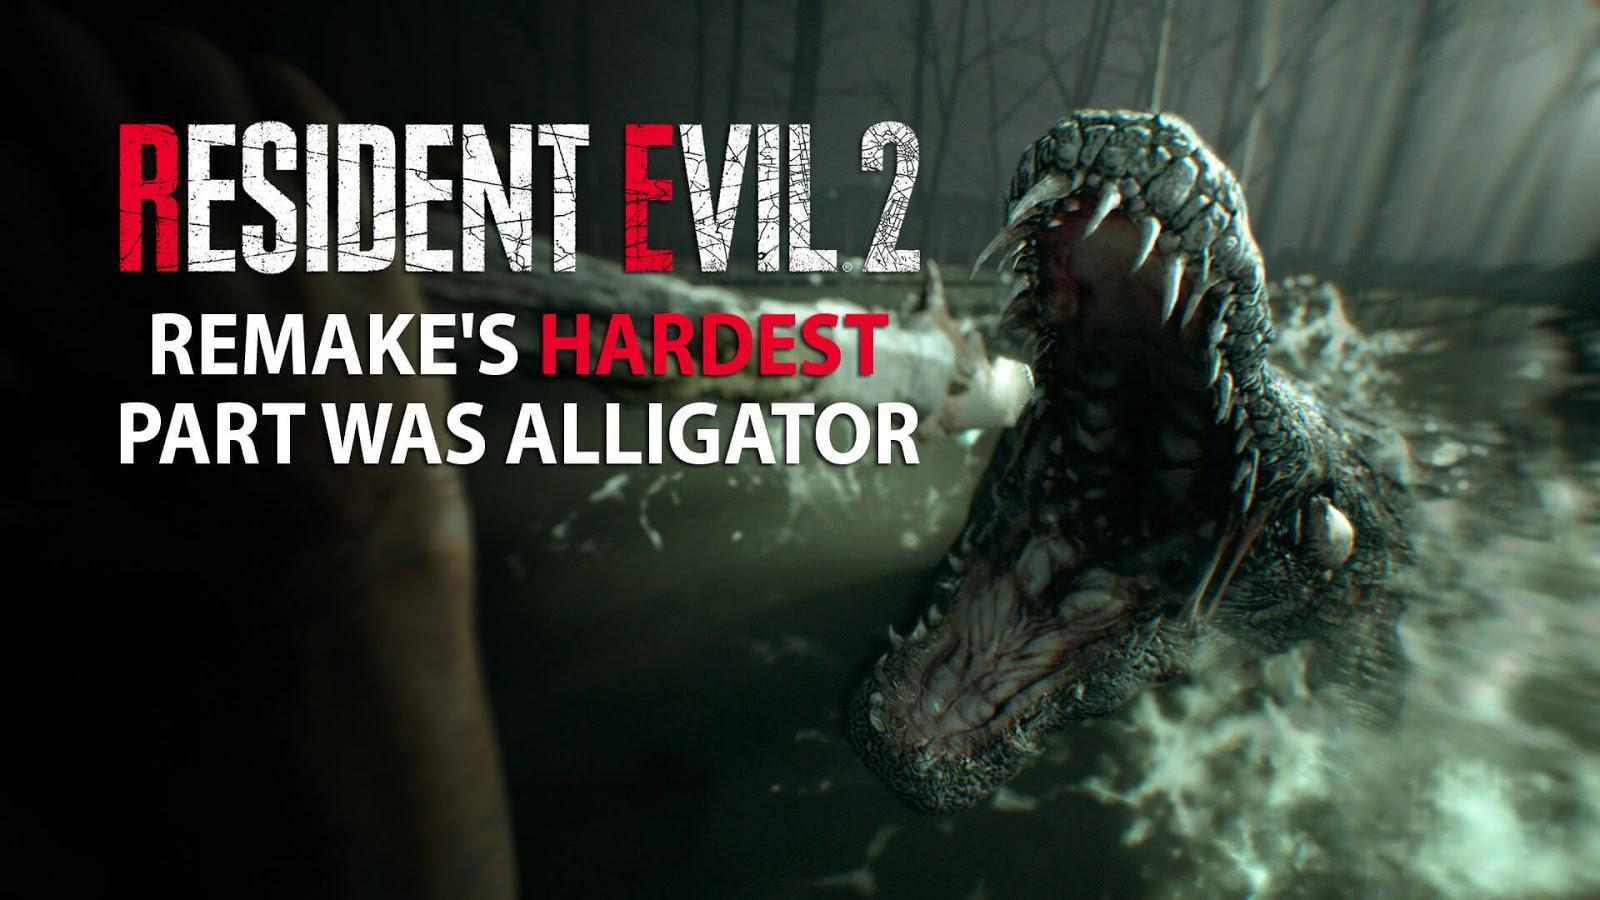 Resident Evil 2 Remake's Hardest Part Was Alligator